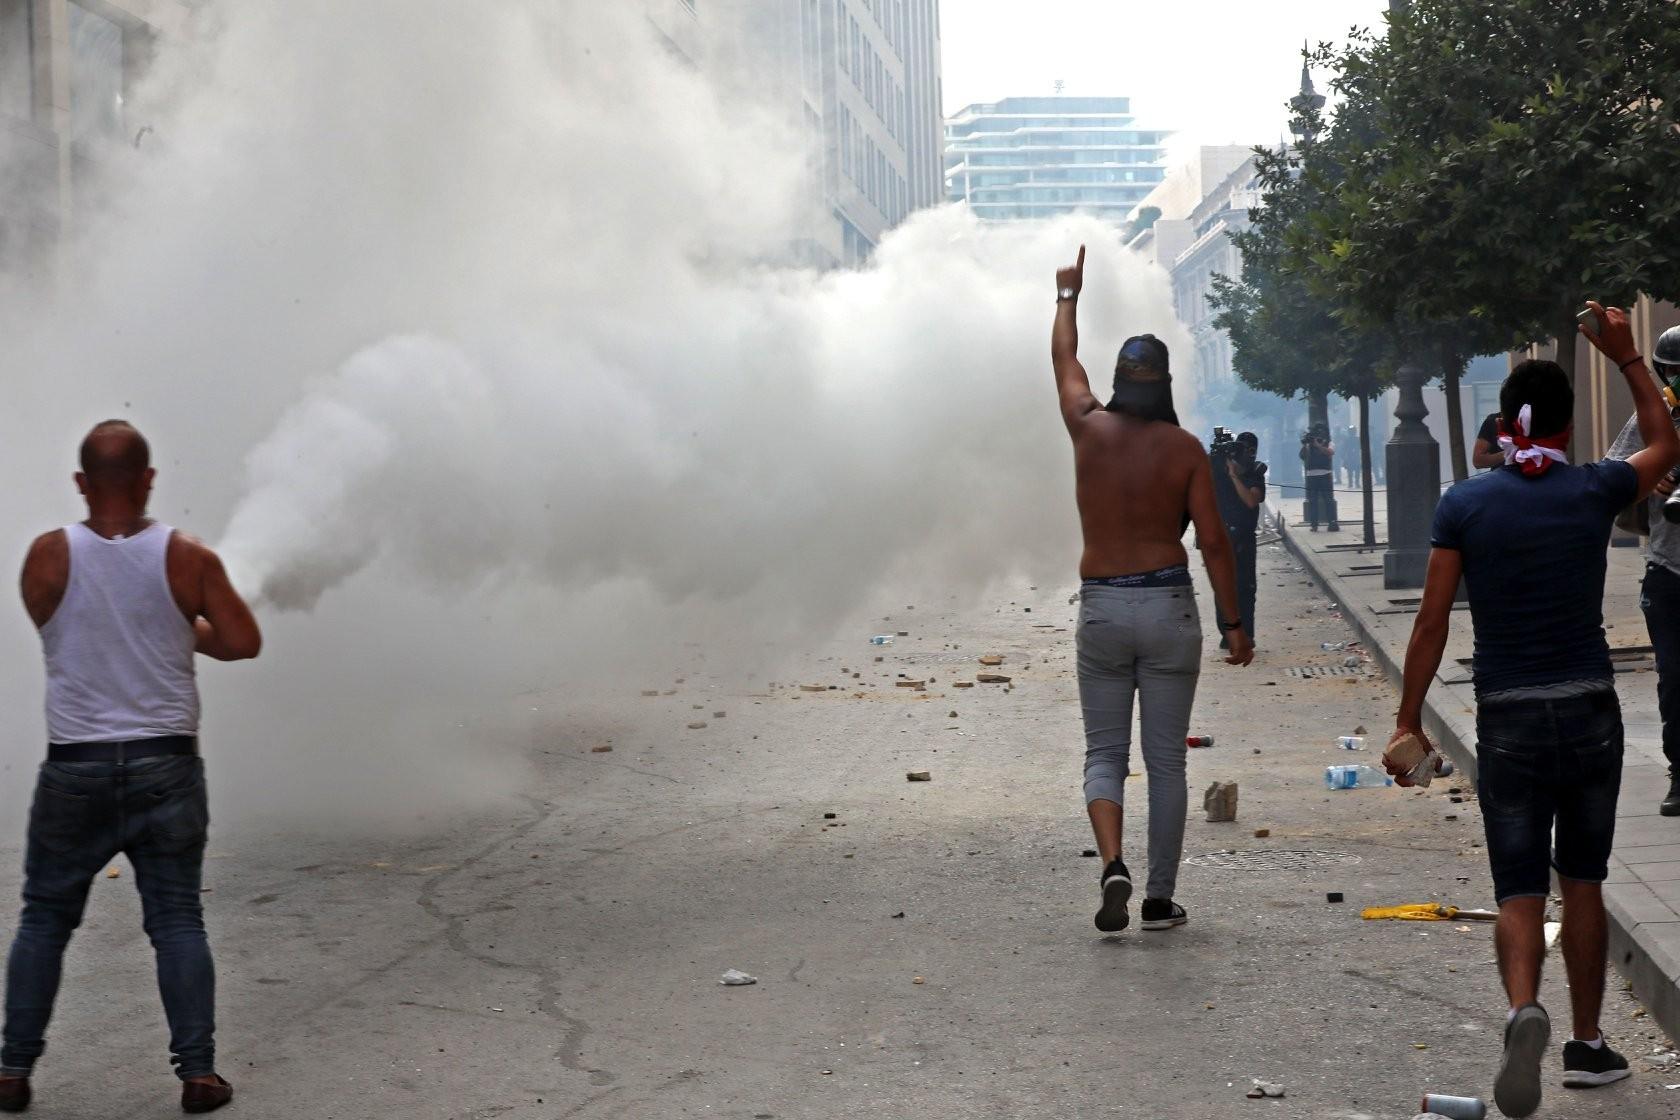 لبنان: تظاهرات واستقالات نواب والجيش يصدر بيانًا